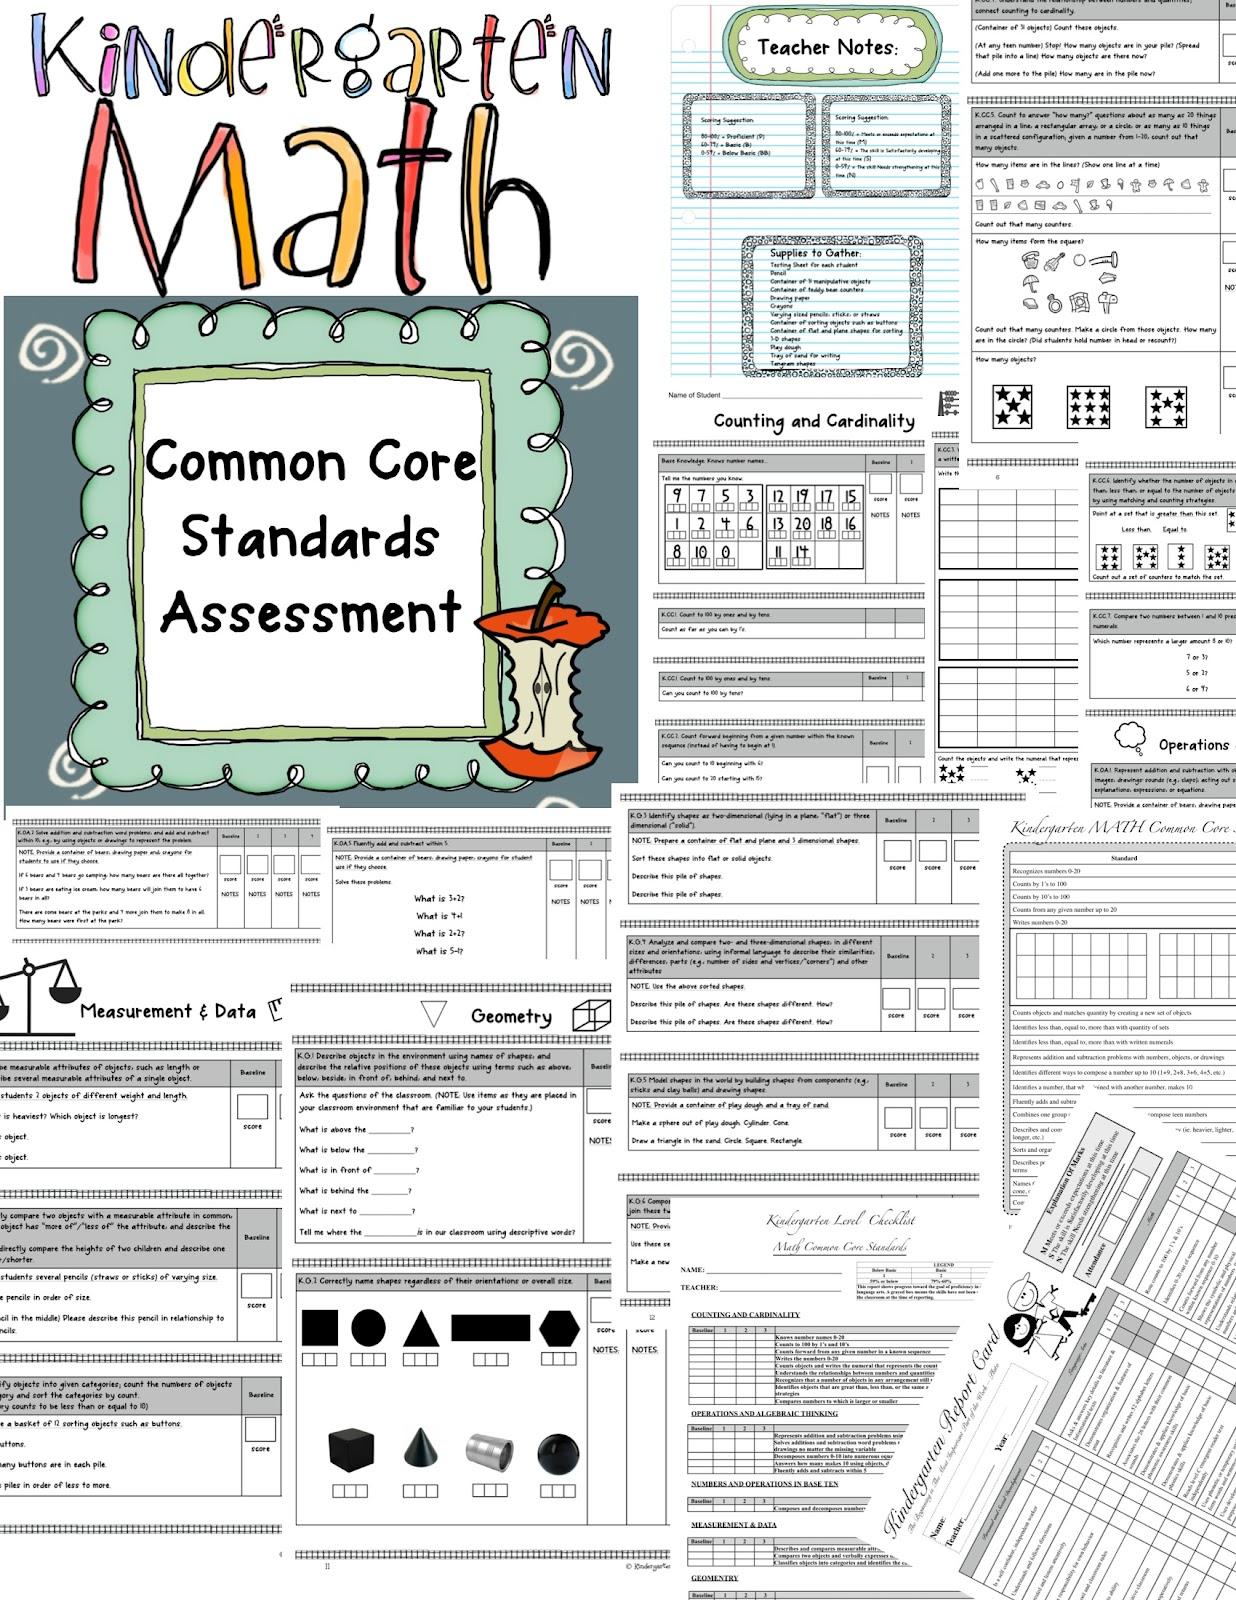 Kindergarten Math Assessments For Common Core Standards